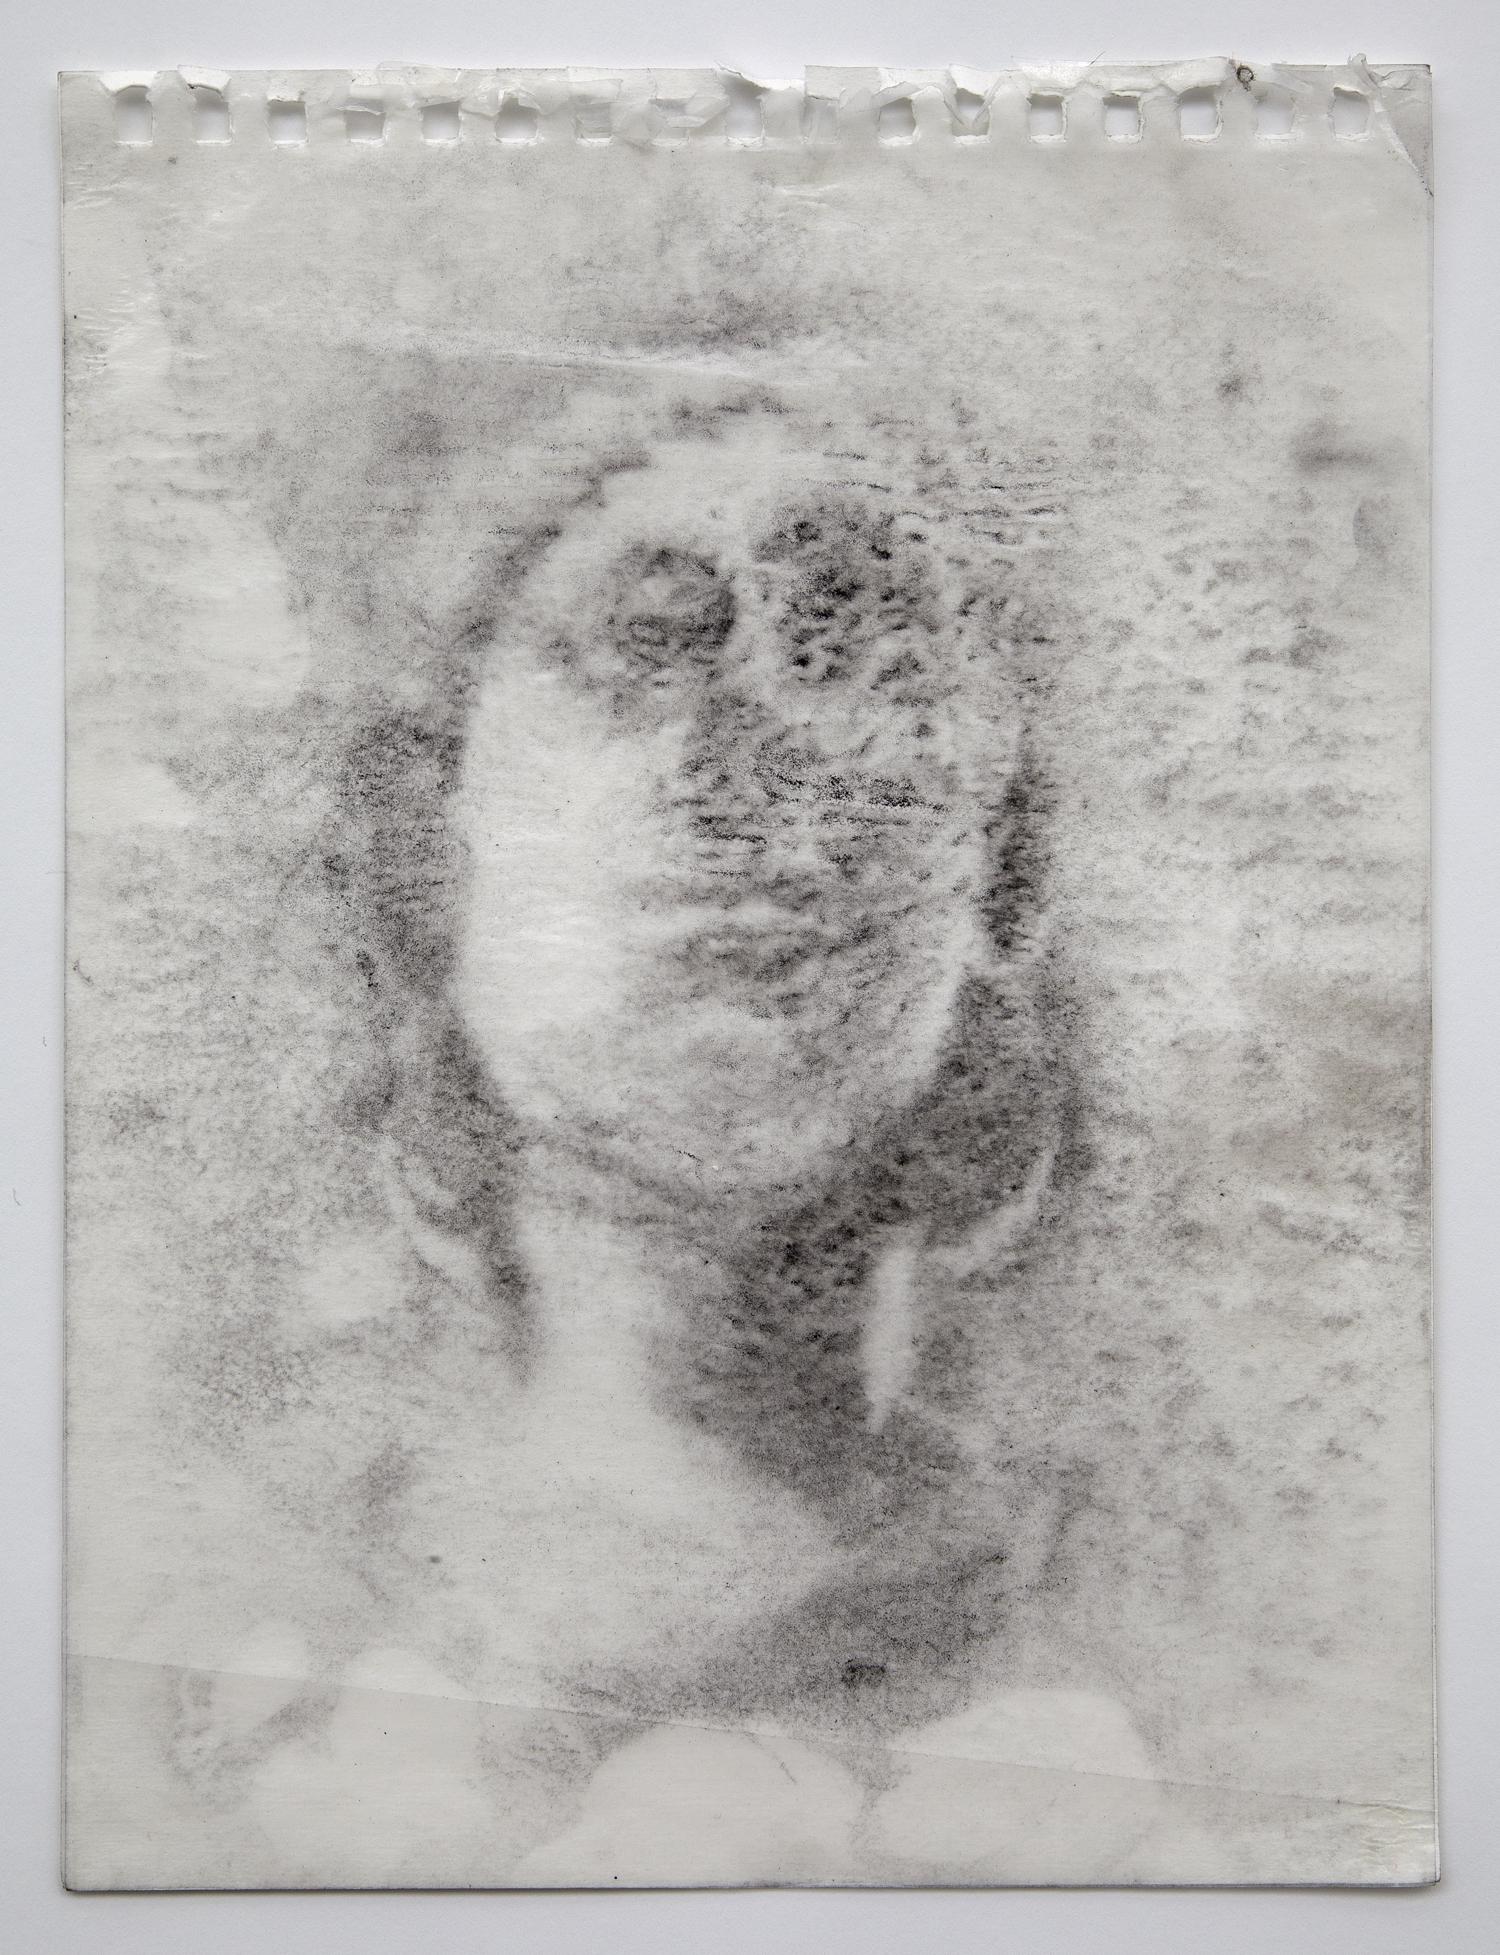 Interleaf Drawing (Roman Sculpture), 2013